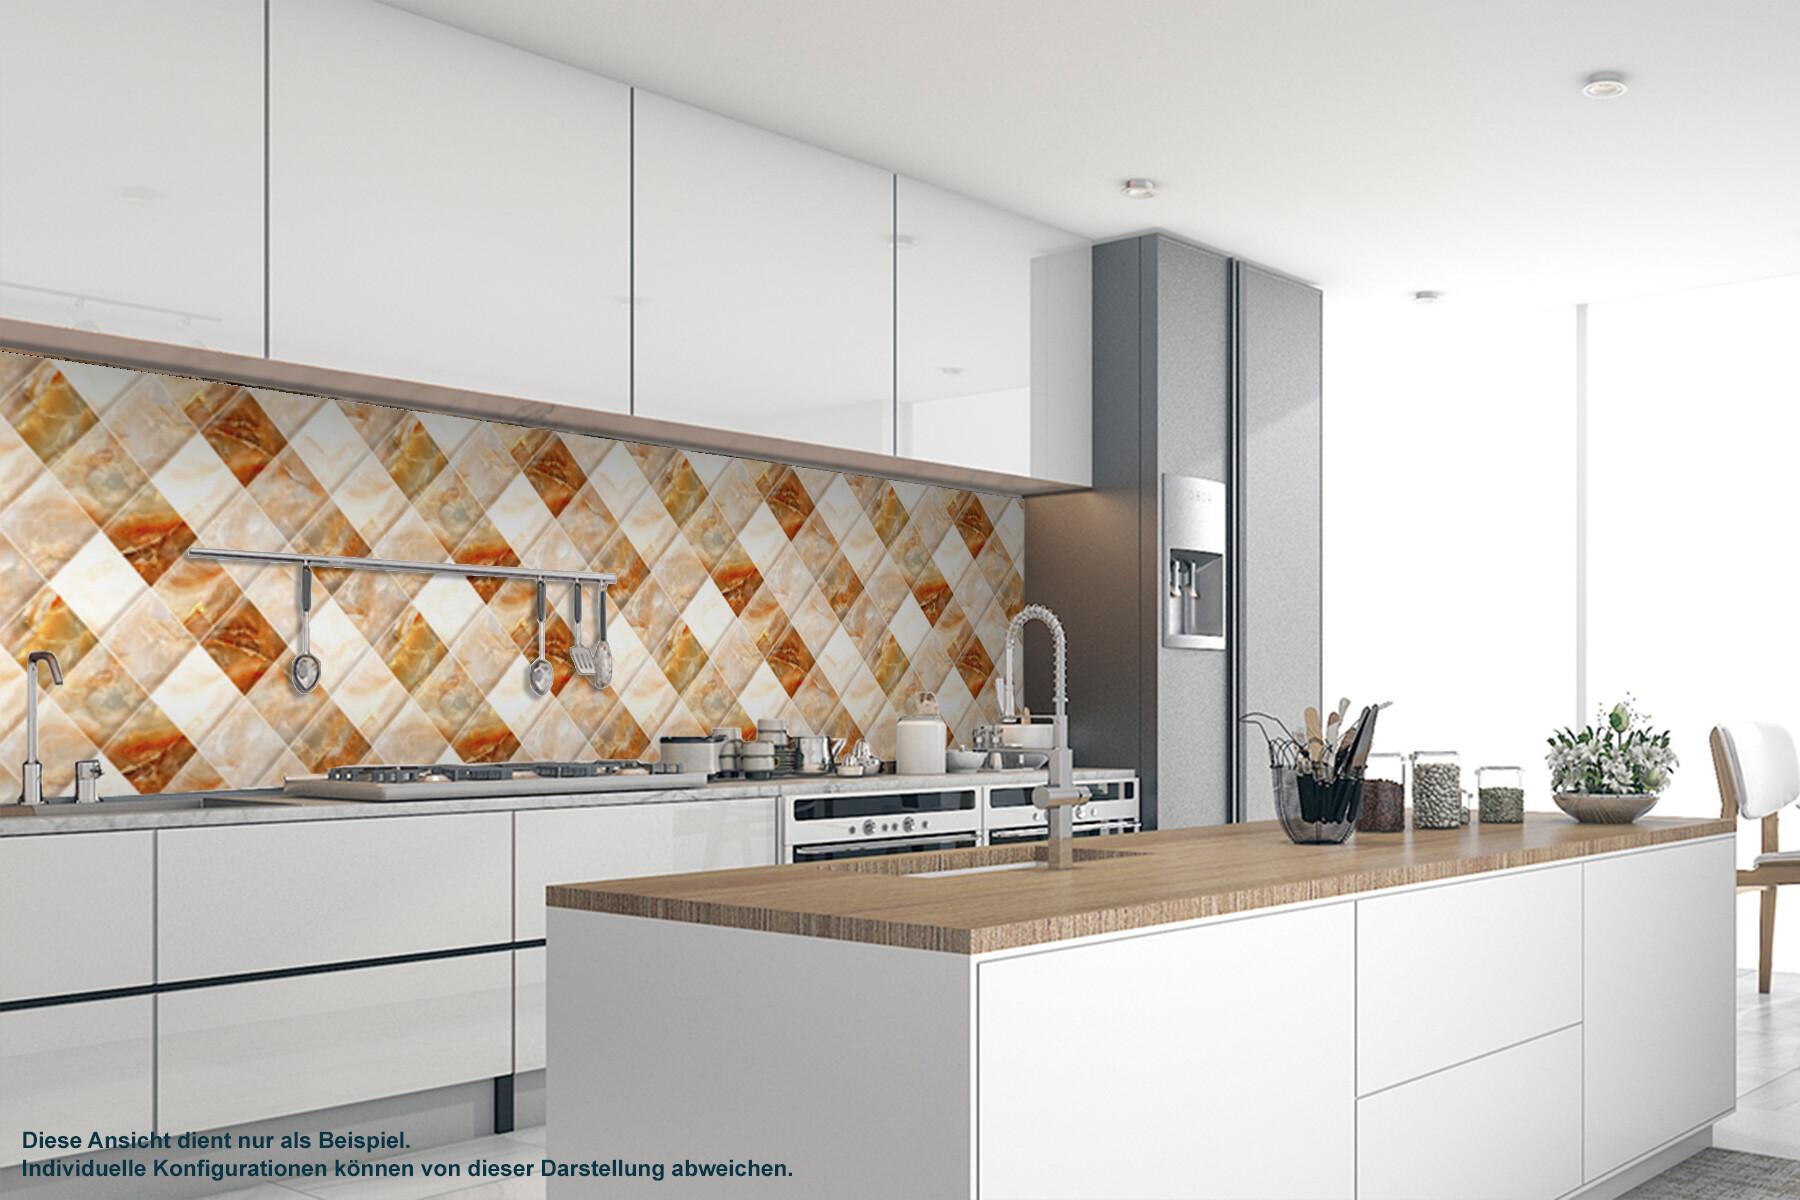 Küche  PlateART Küchenrückwand mit Motiv Marmor Beige Kacheln